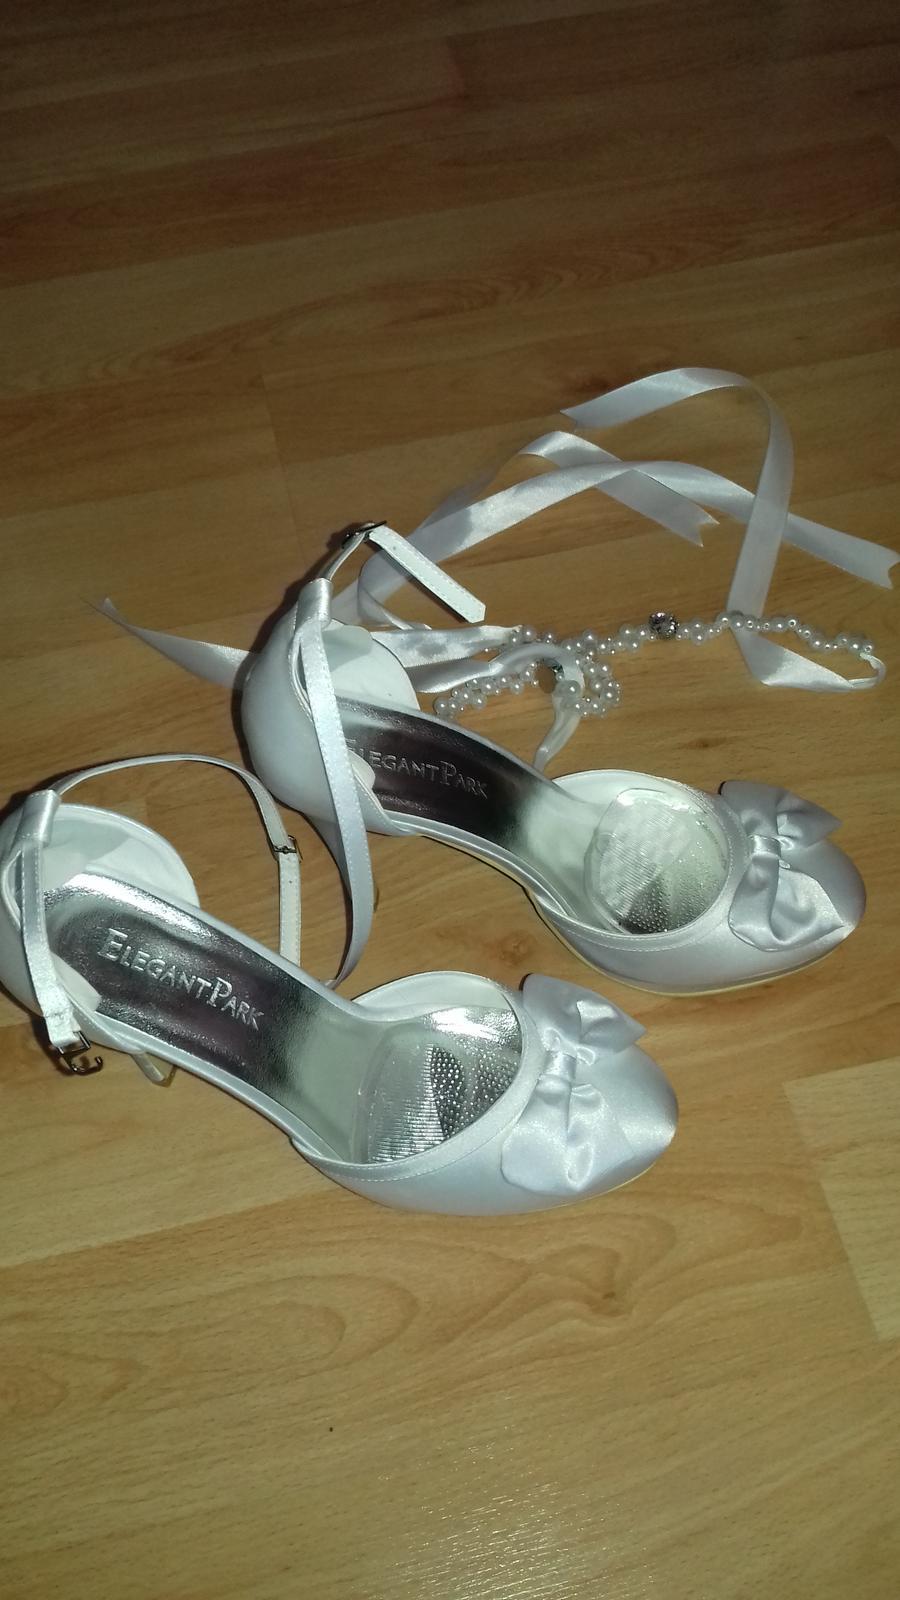 Svadobné biele topánky - Obrázok č. 2